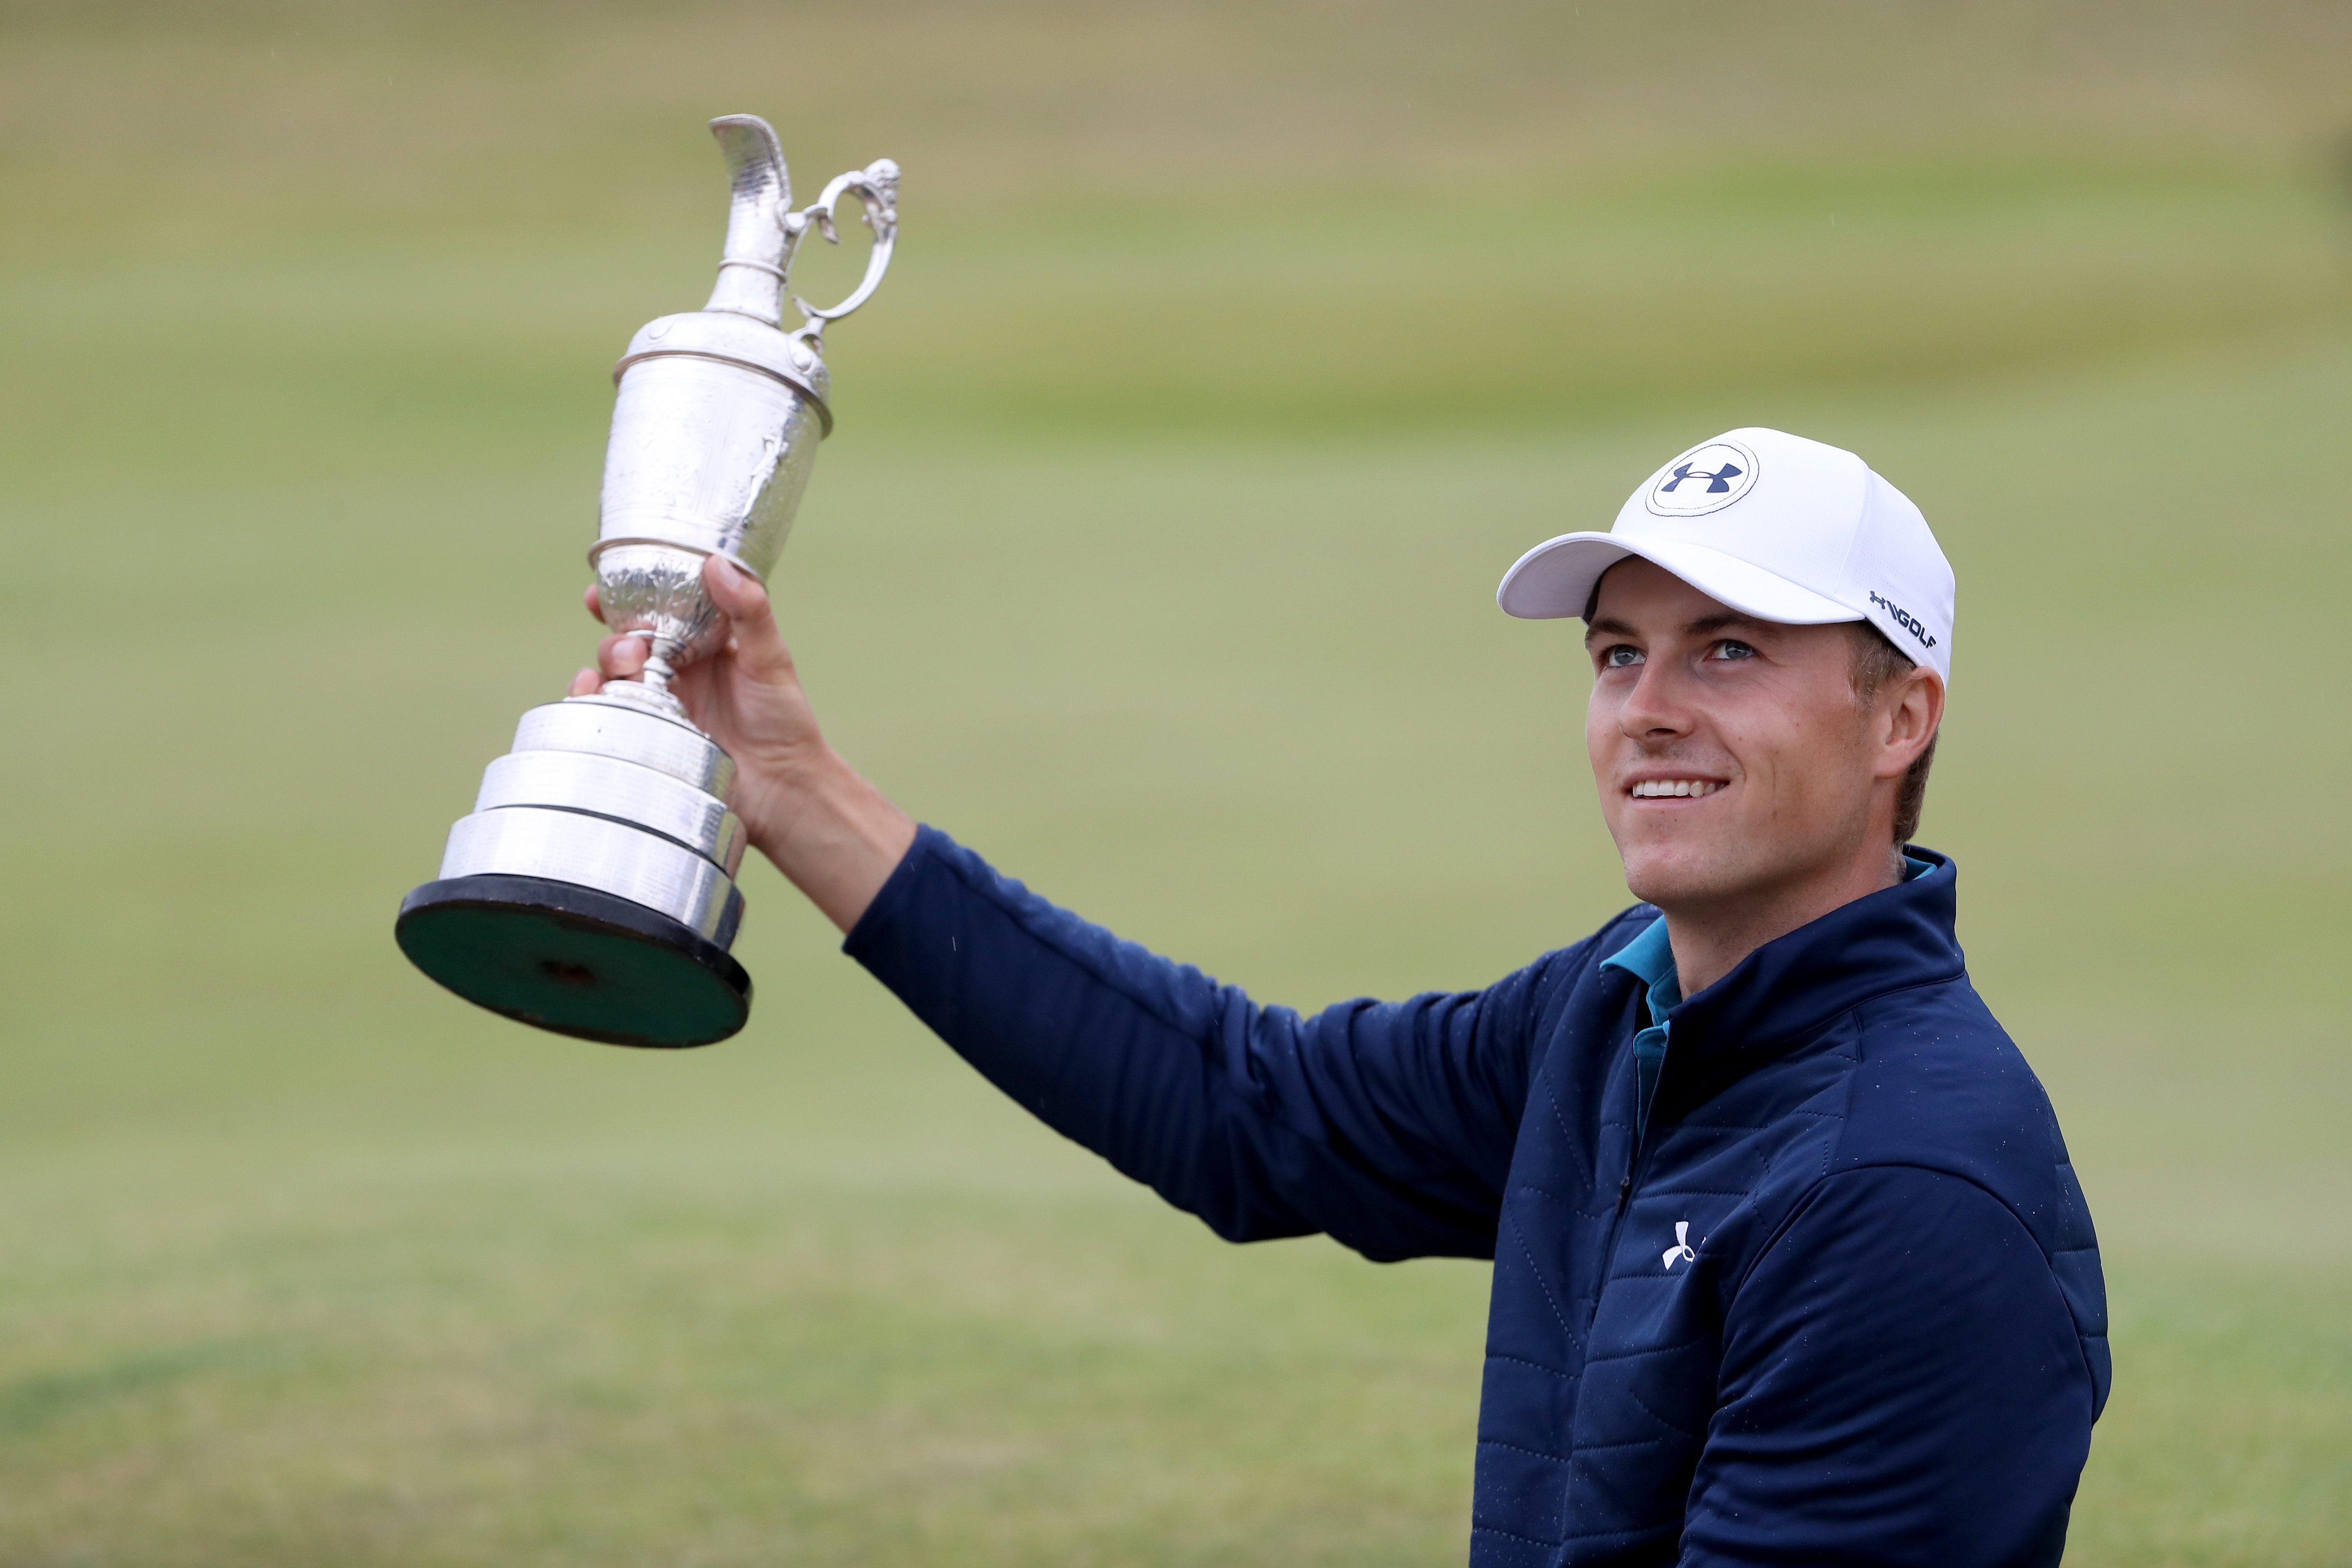 Jordan Spieth Wins Open Championship